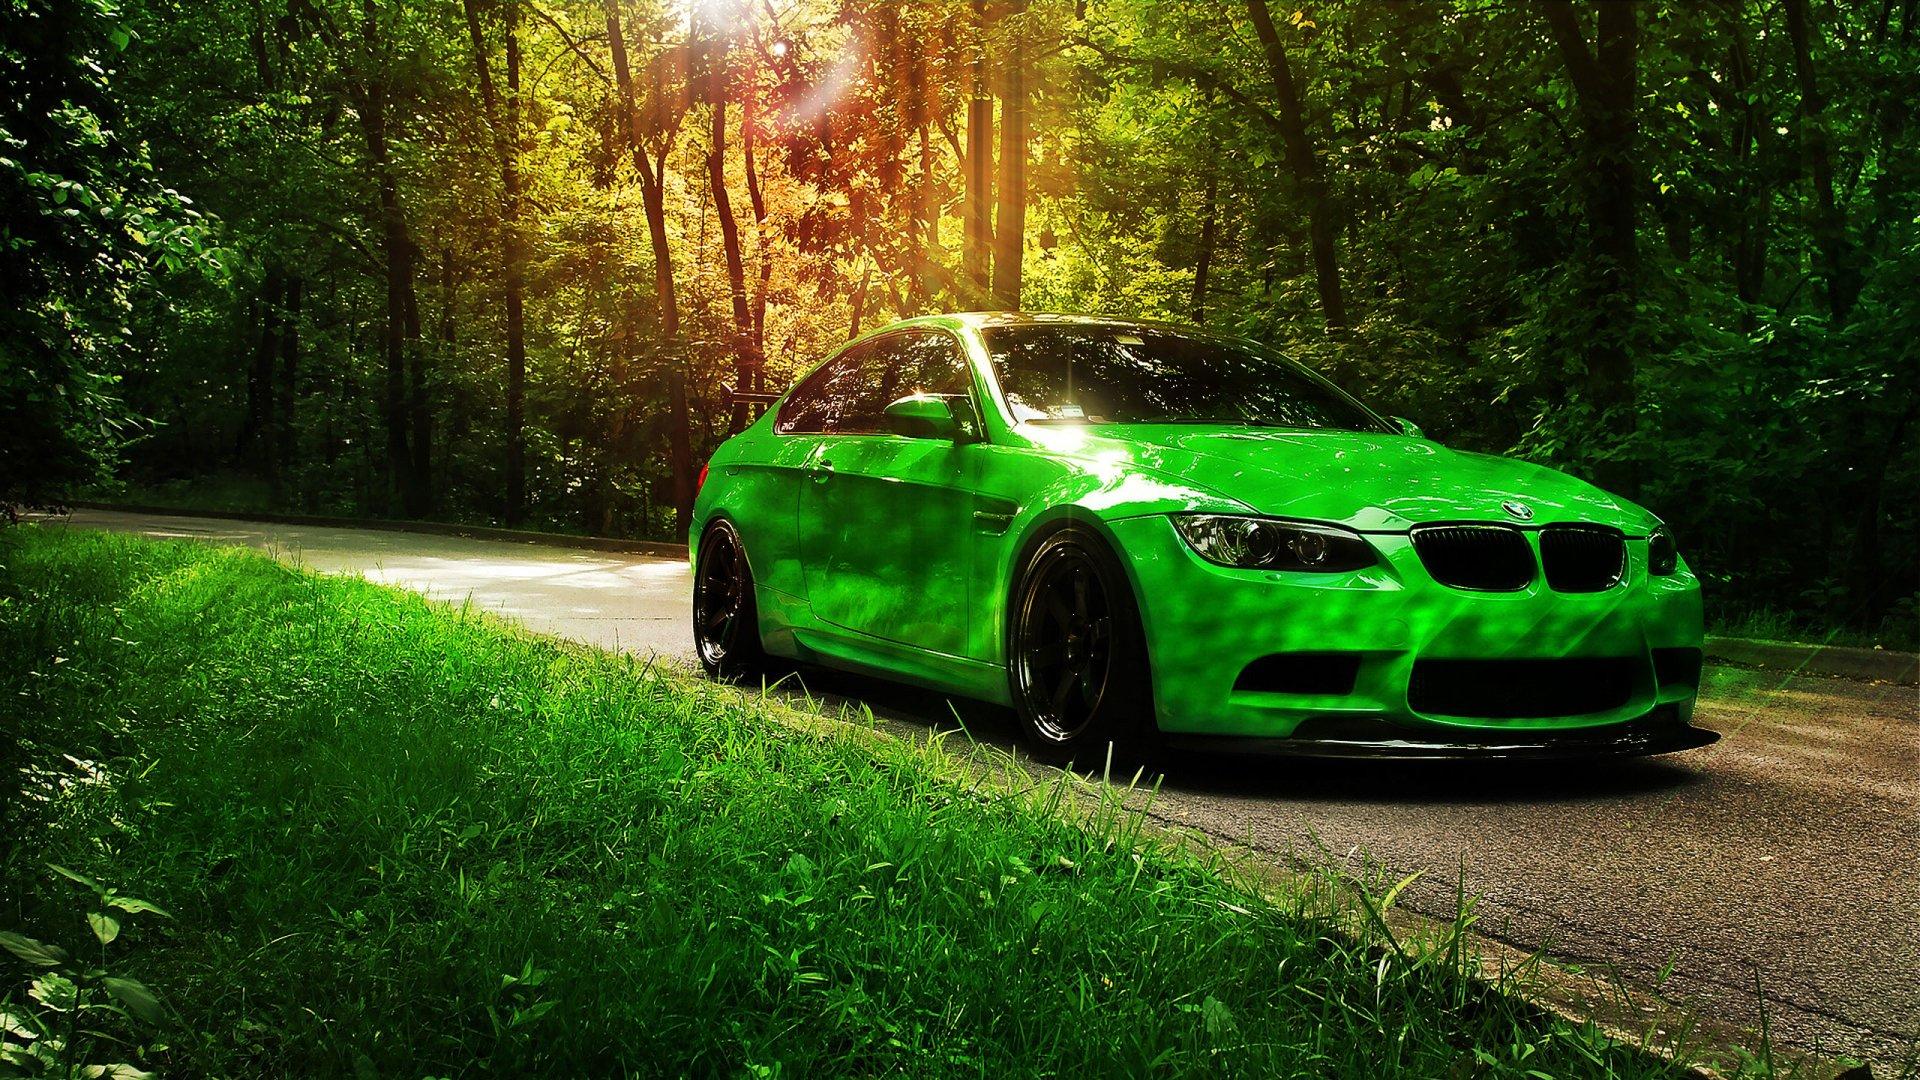 car wallpaper,green,vehicle,car,automotive design,bmw